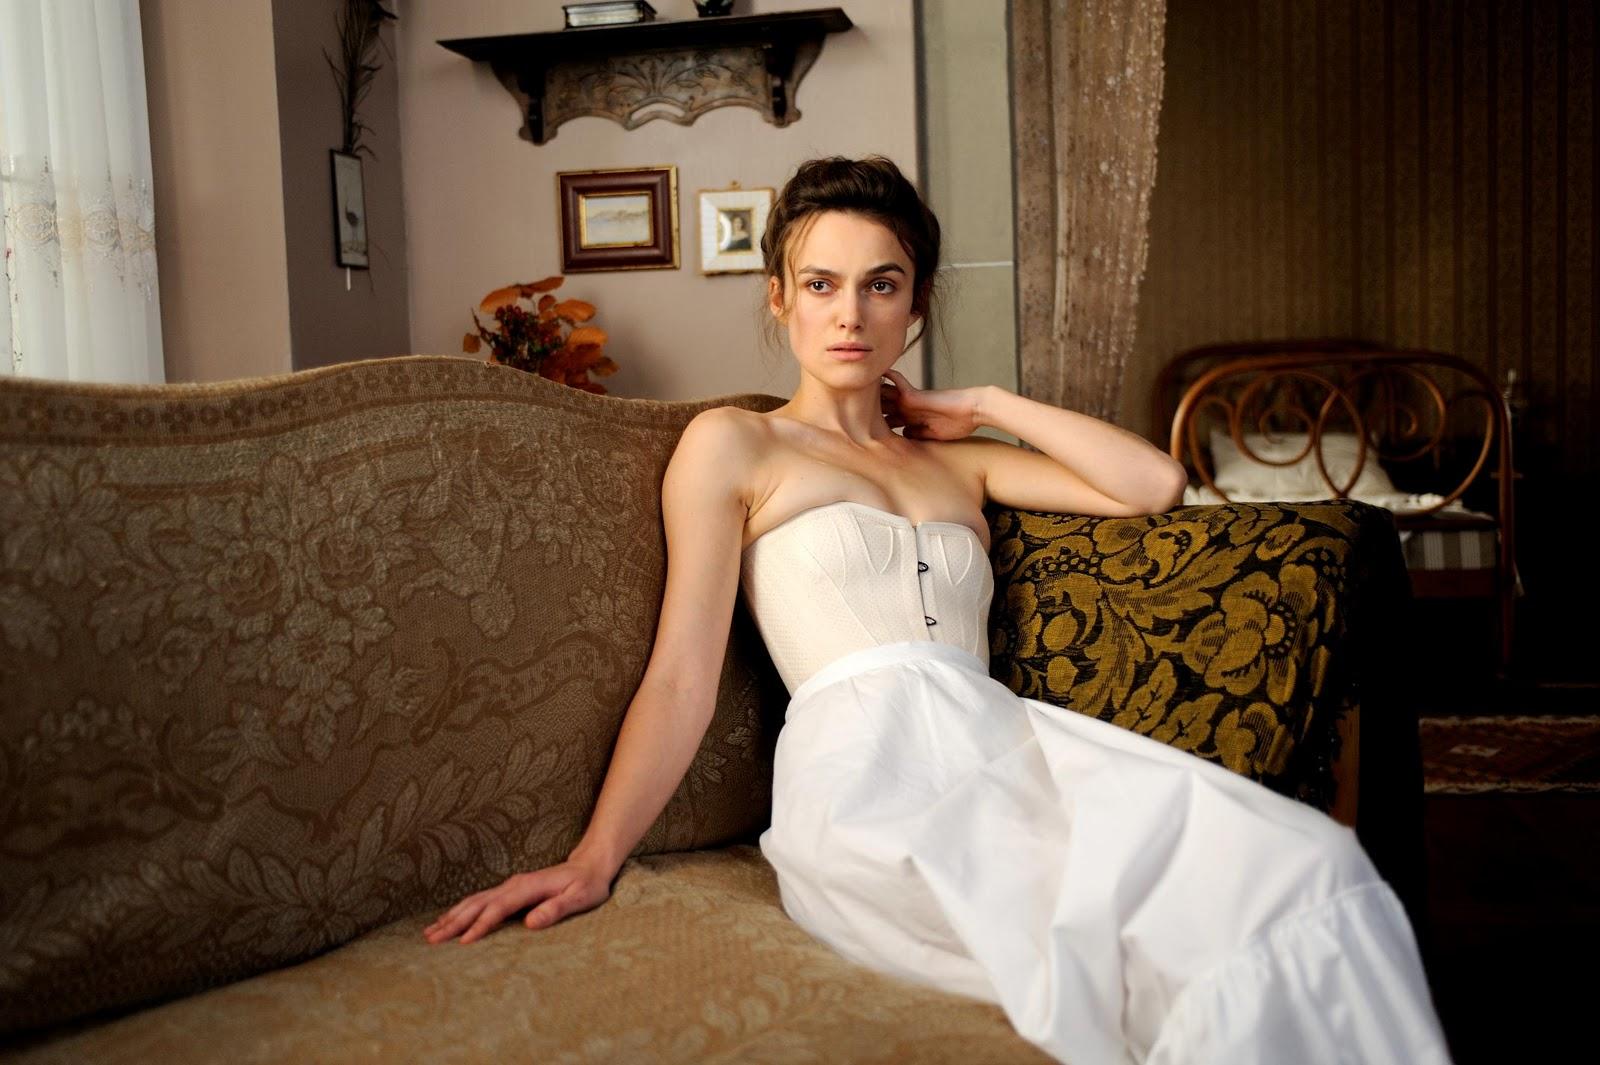 http://2.bp.blogspot.com/-D_k21aqA3dY/TyuhtrzSV9I/AAAAAAAAEXI/tOW7u8HKJNA/s1600/Keira+Knightley+A+Dangerous+Method+White+Dress+Cronenberg+Fassbender.jpg